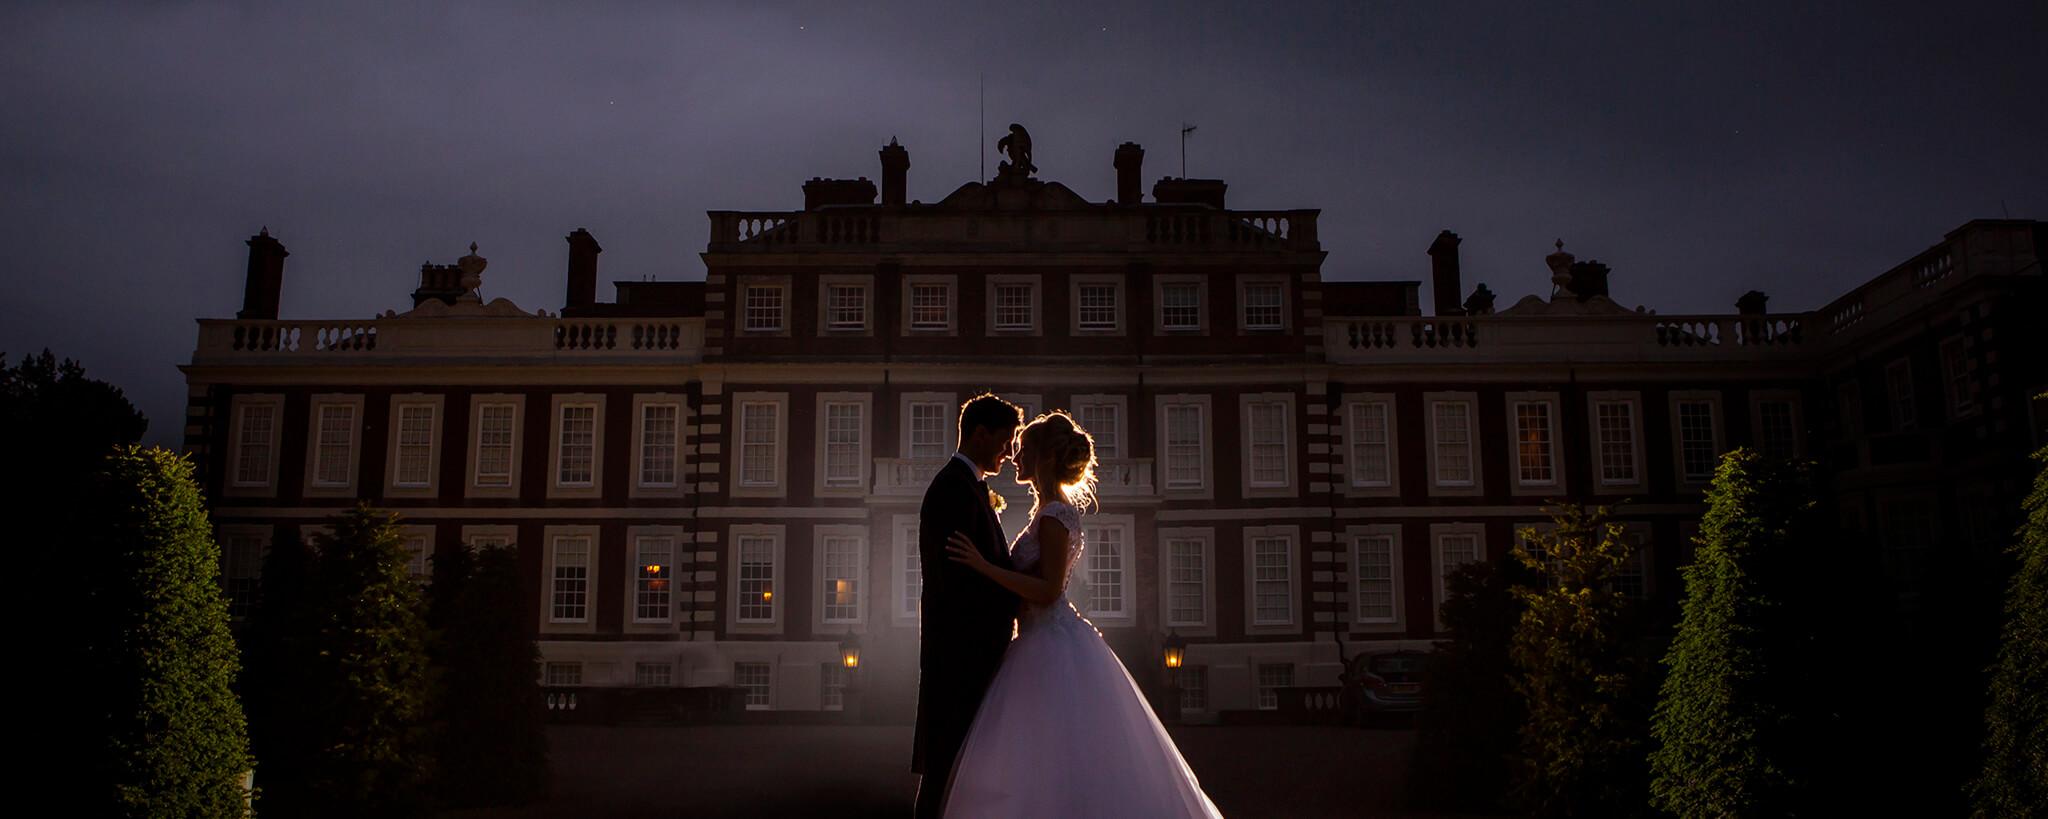 best-wedding-photographers-london-stanbury-photography